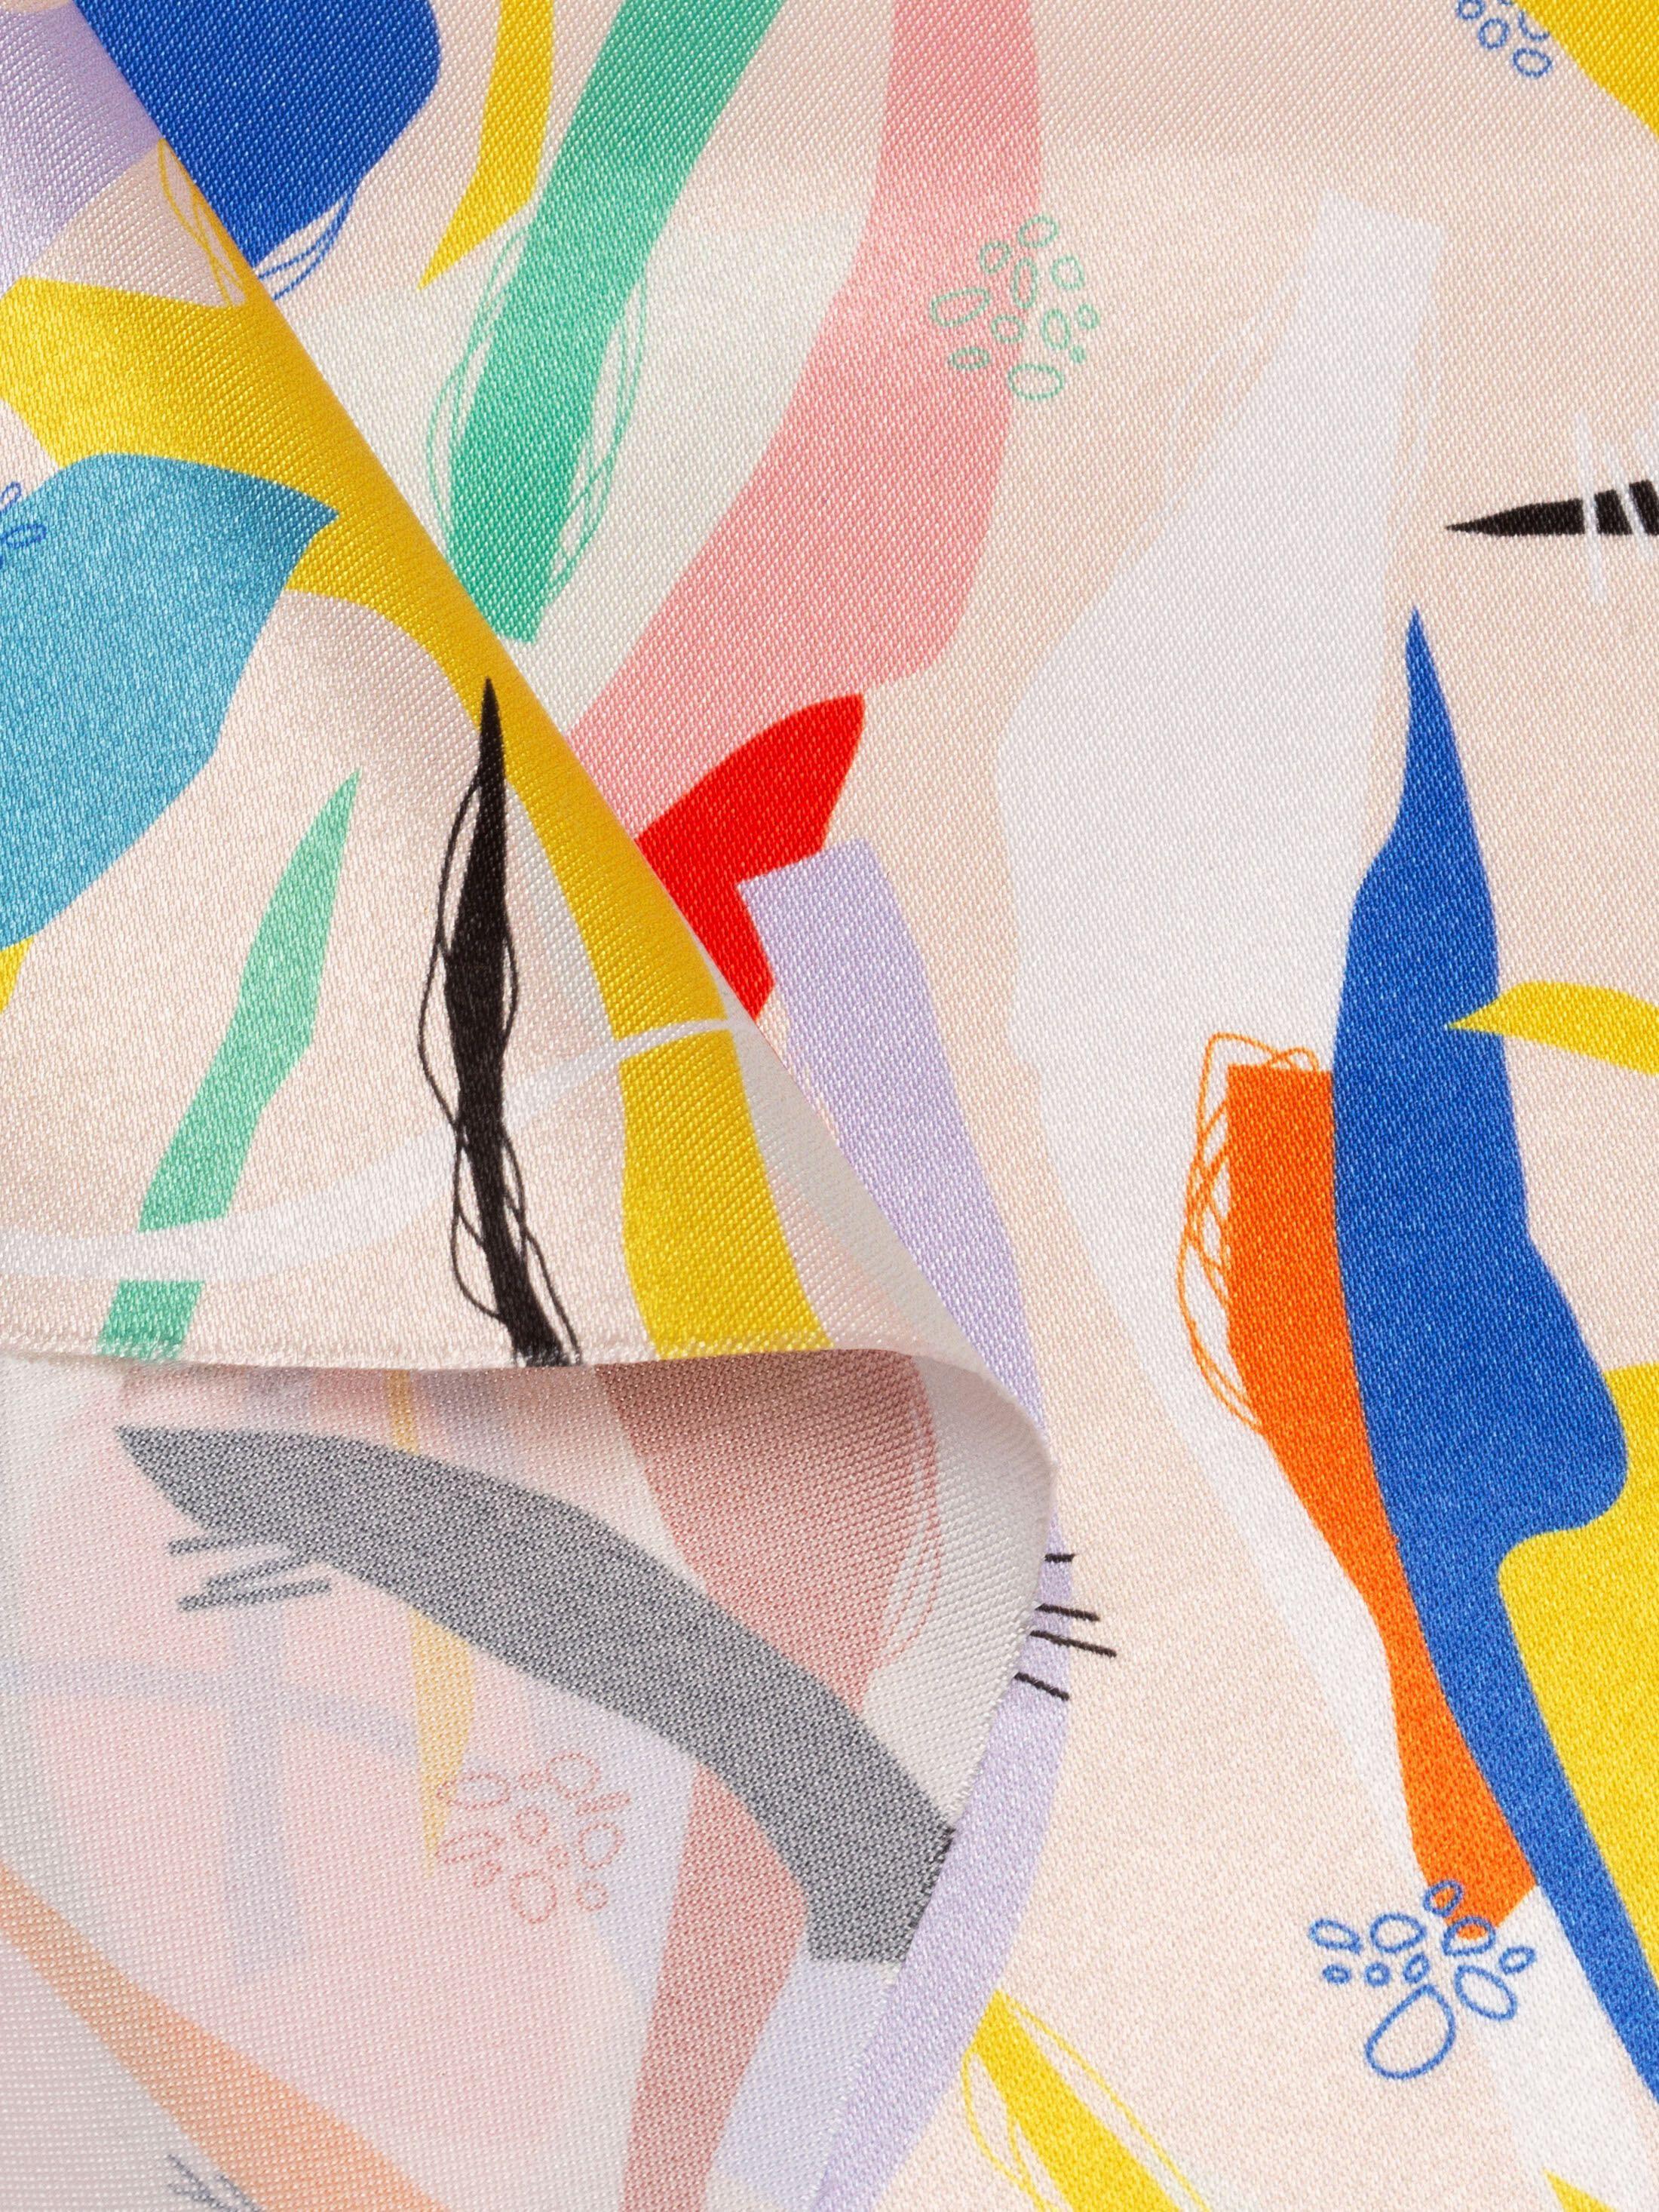 custom made Lucent Satin fabric shiny suface